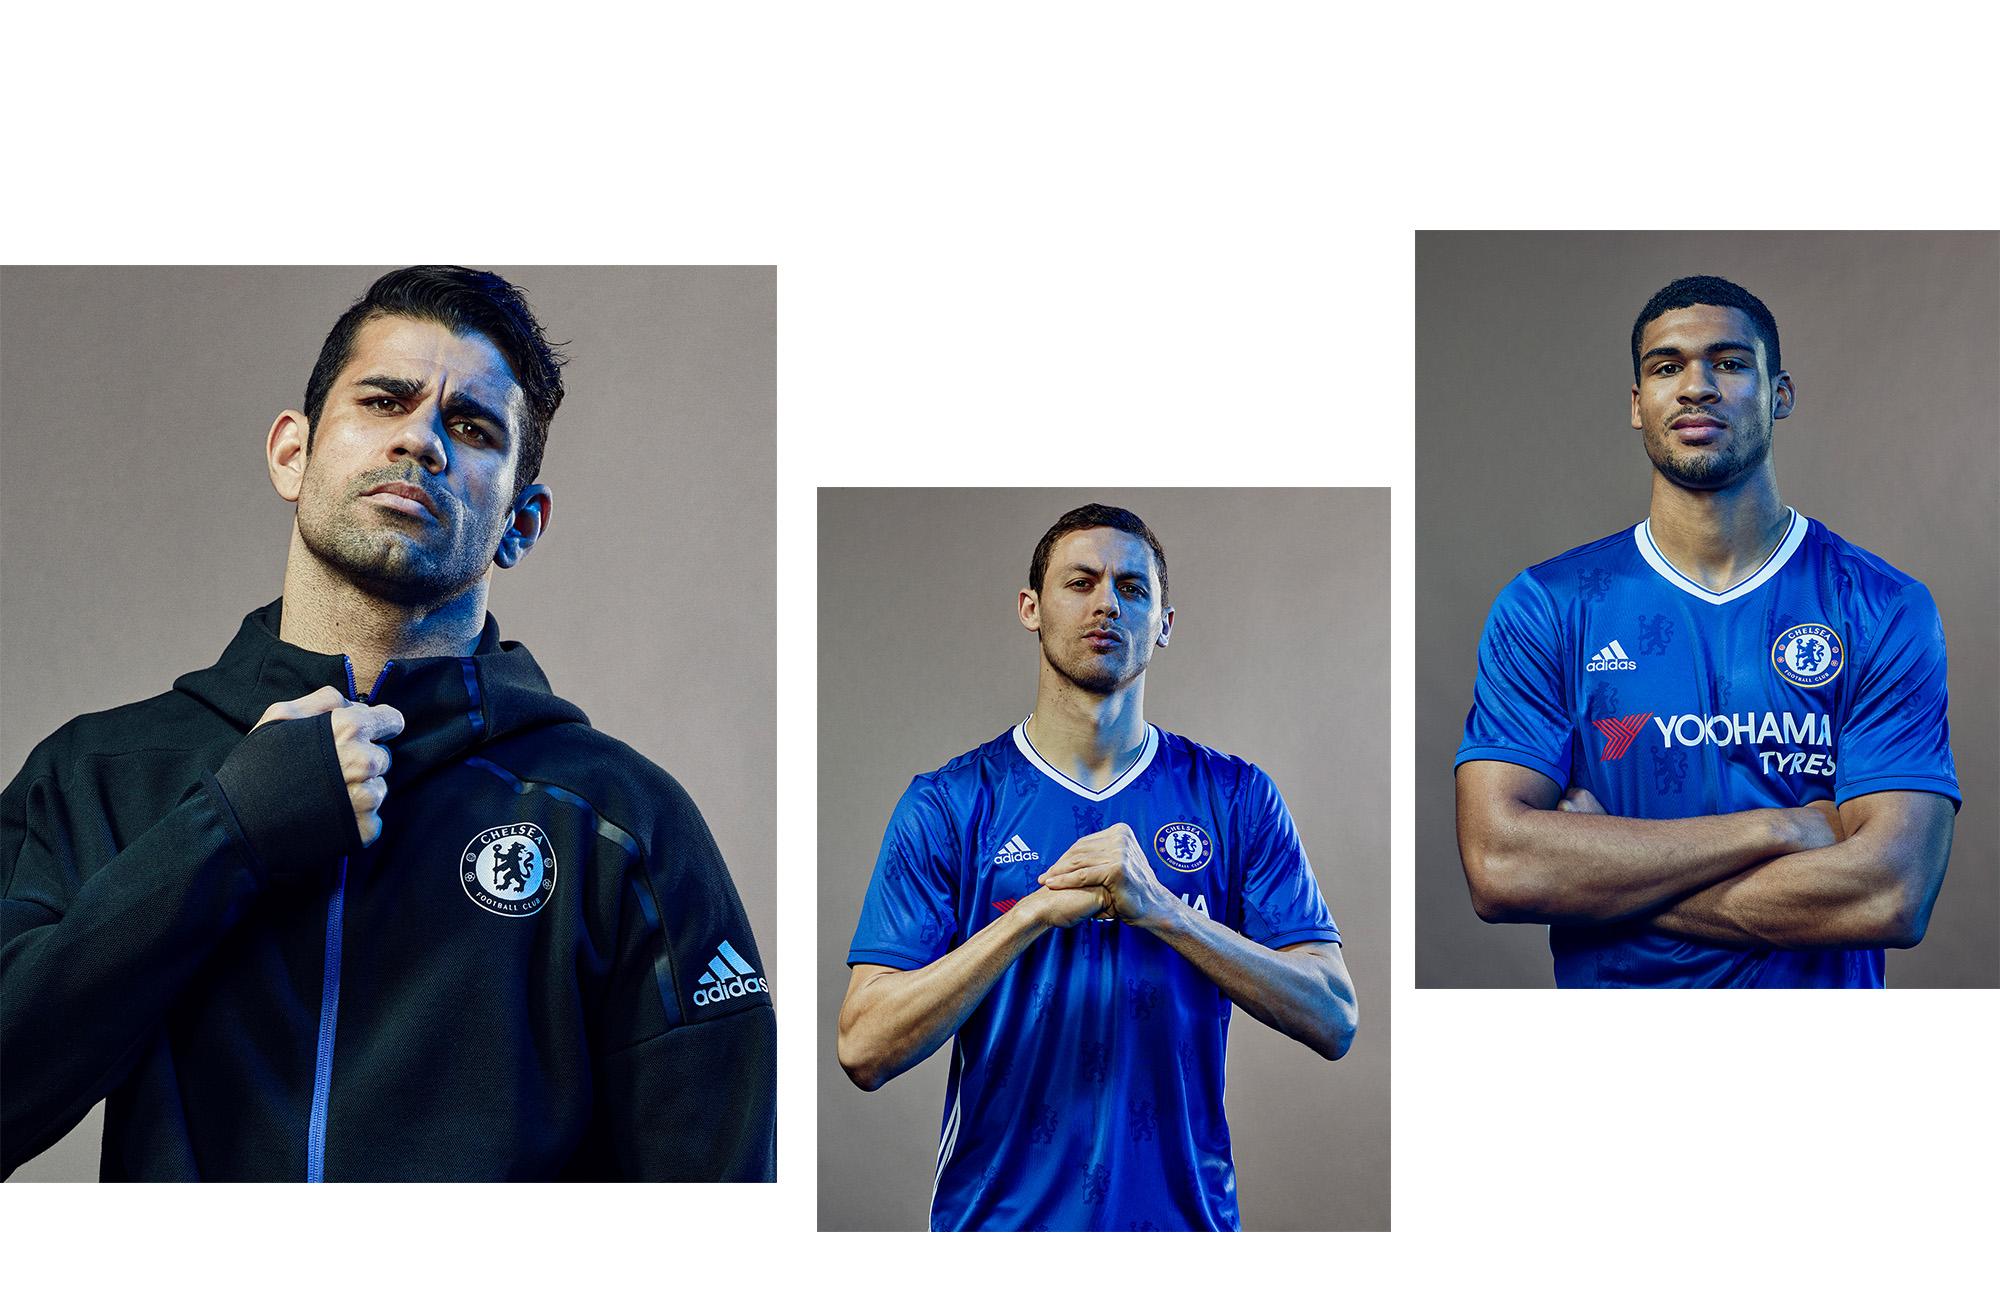 Super Chelsea - 5 of 6